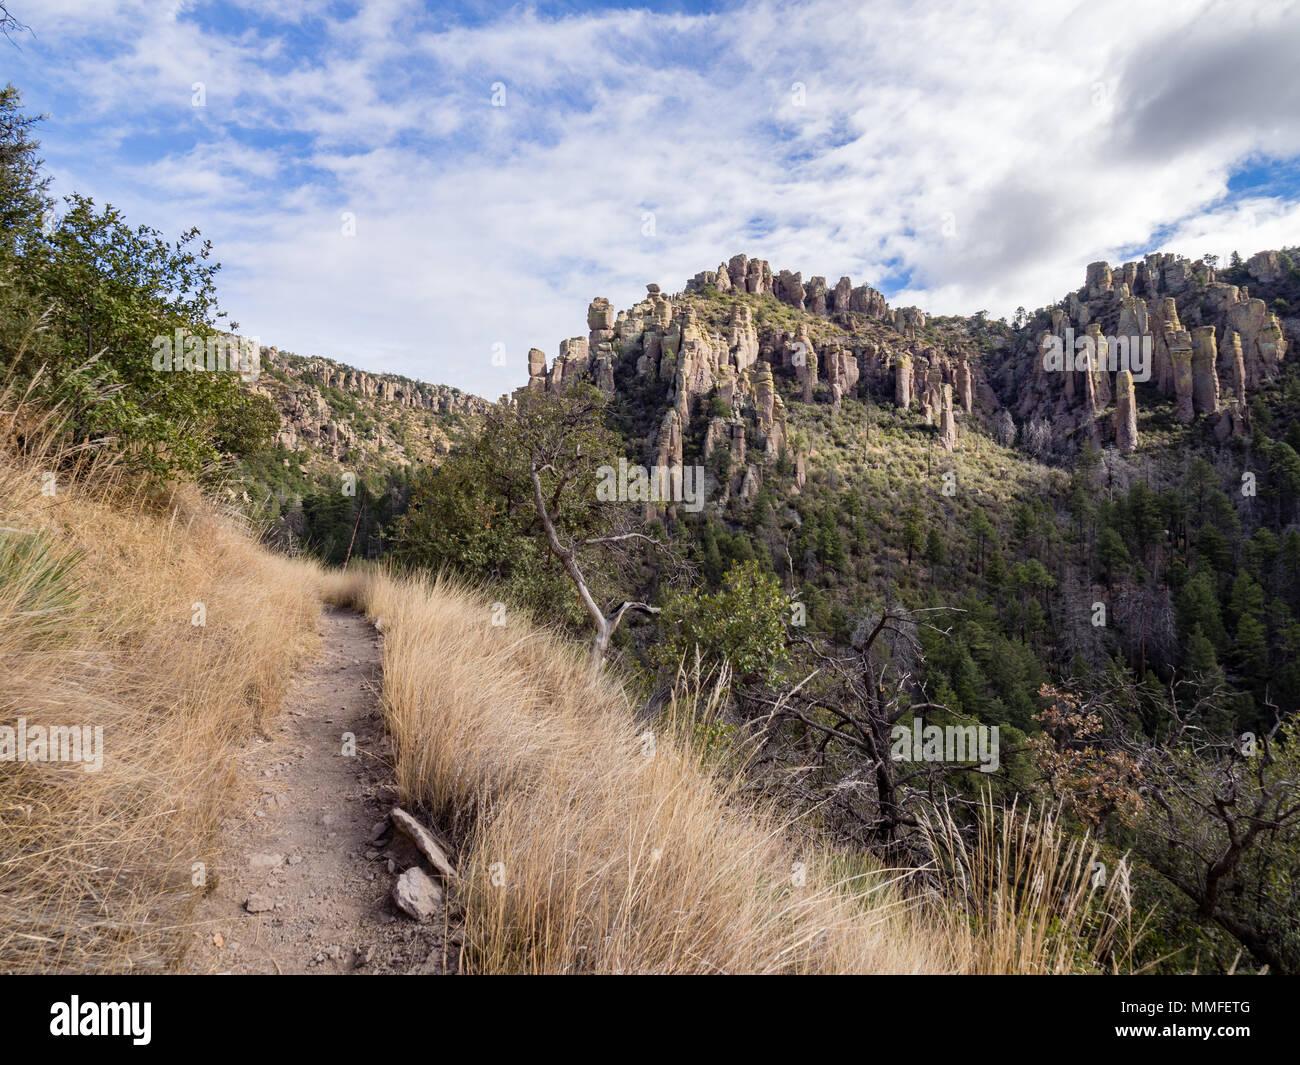 Hailstone Trail, Chiricahua National Monument, near Willcox